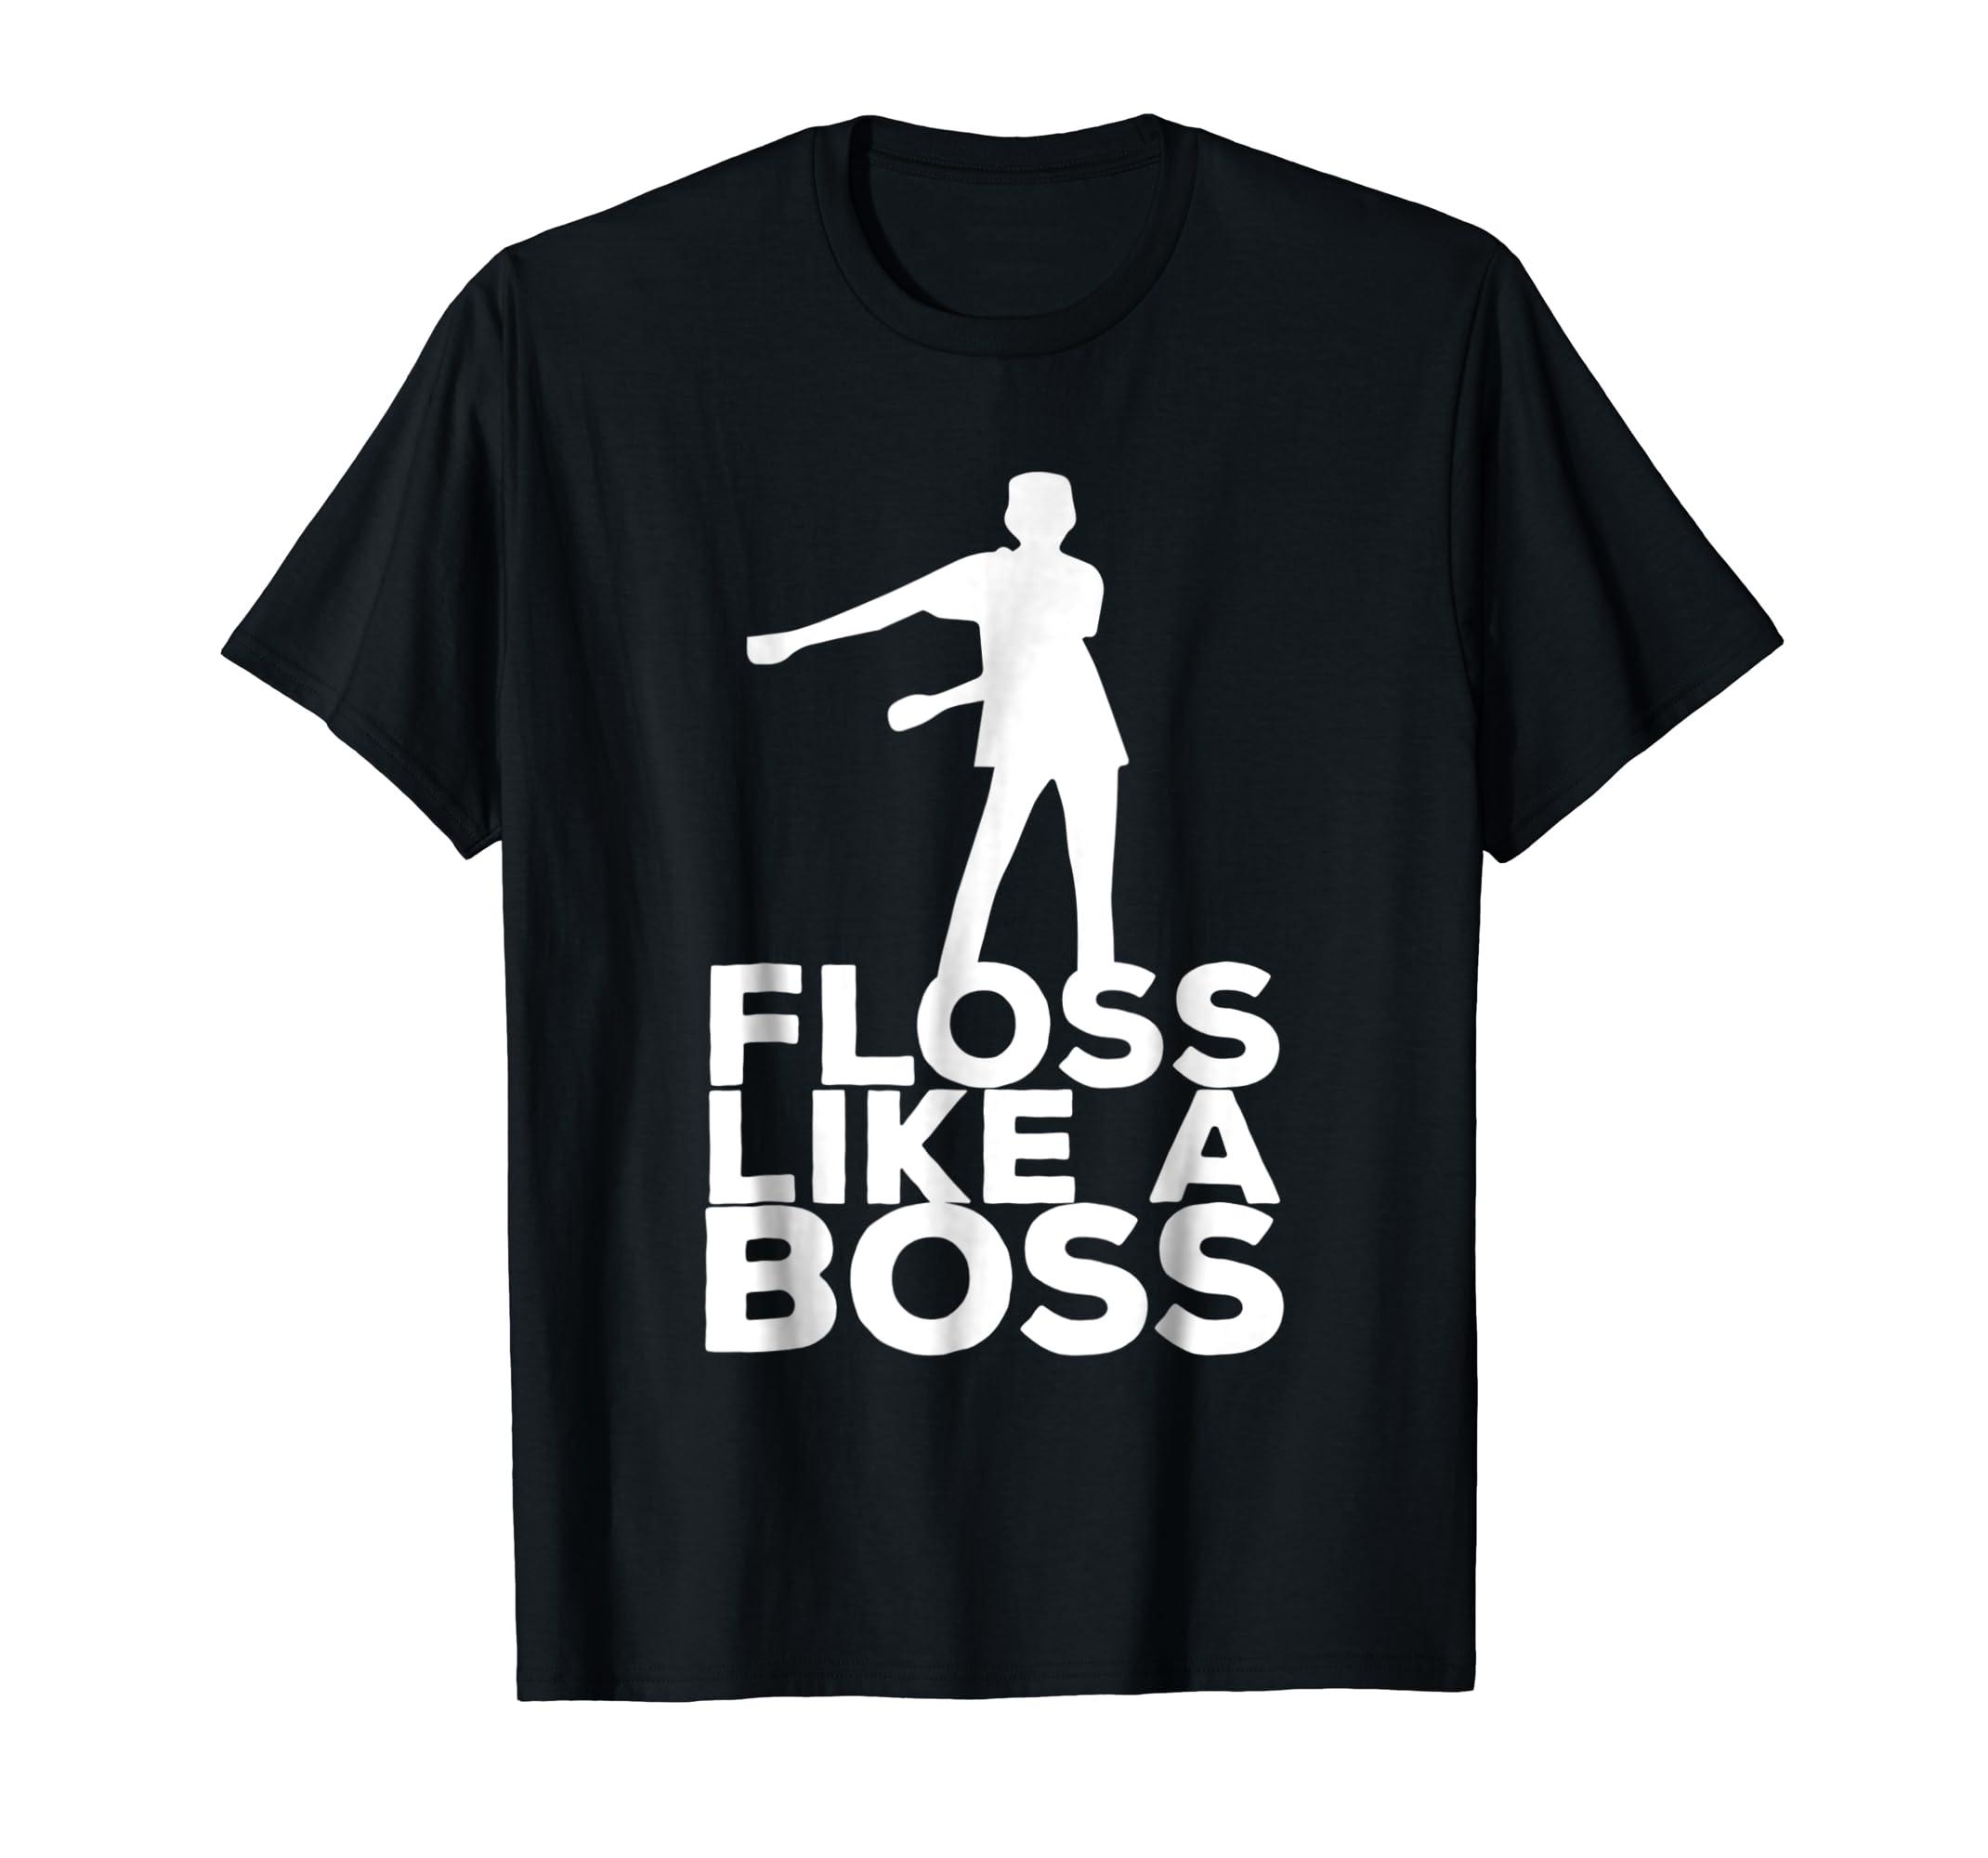 809ad64cb Amazon.com: Floss Like A Boss Dance T-Shirt: Clothing